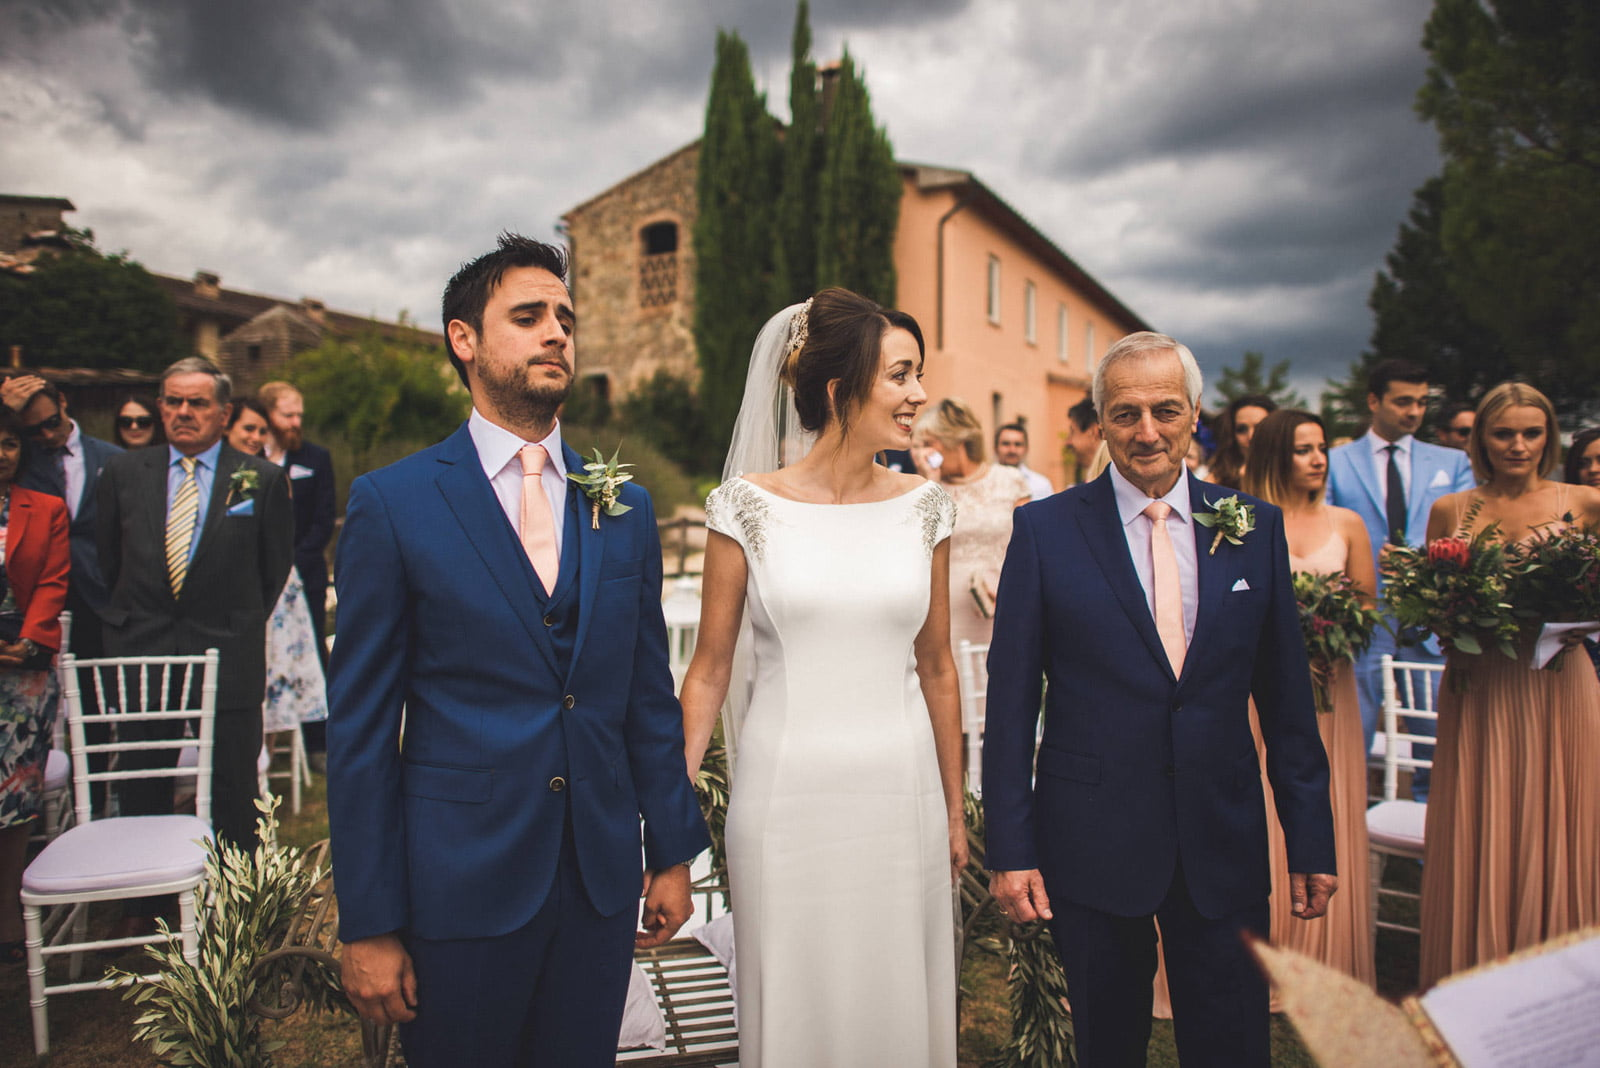 049-wedding-tuscany-san-galgano-federico-pannacci-photographer